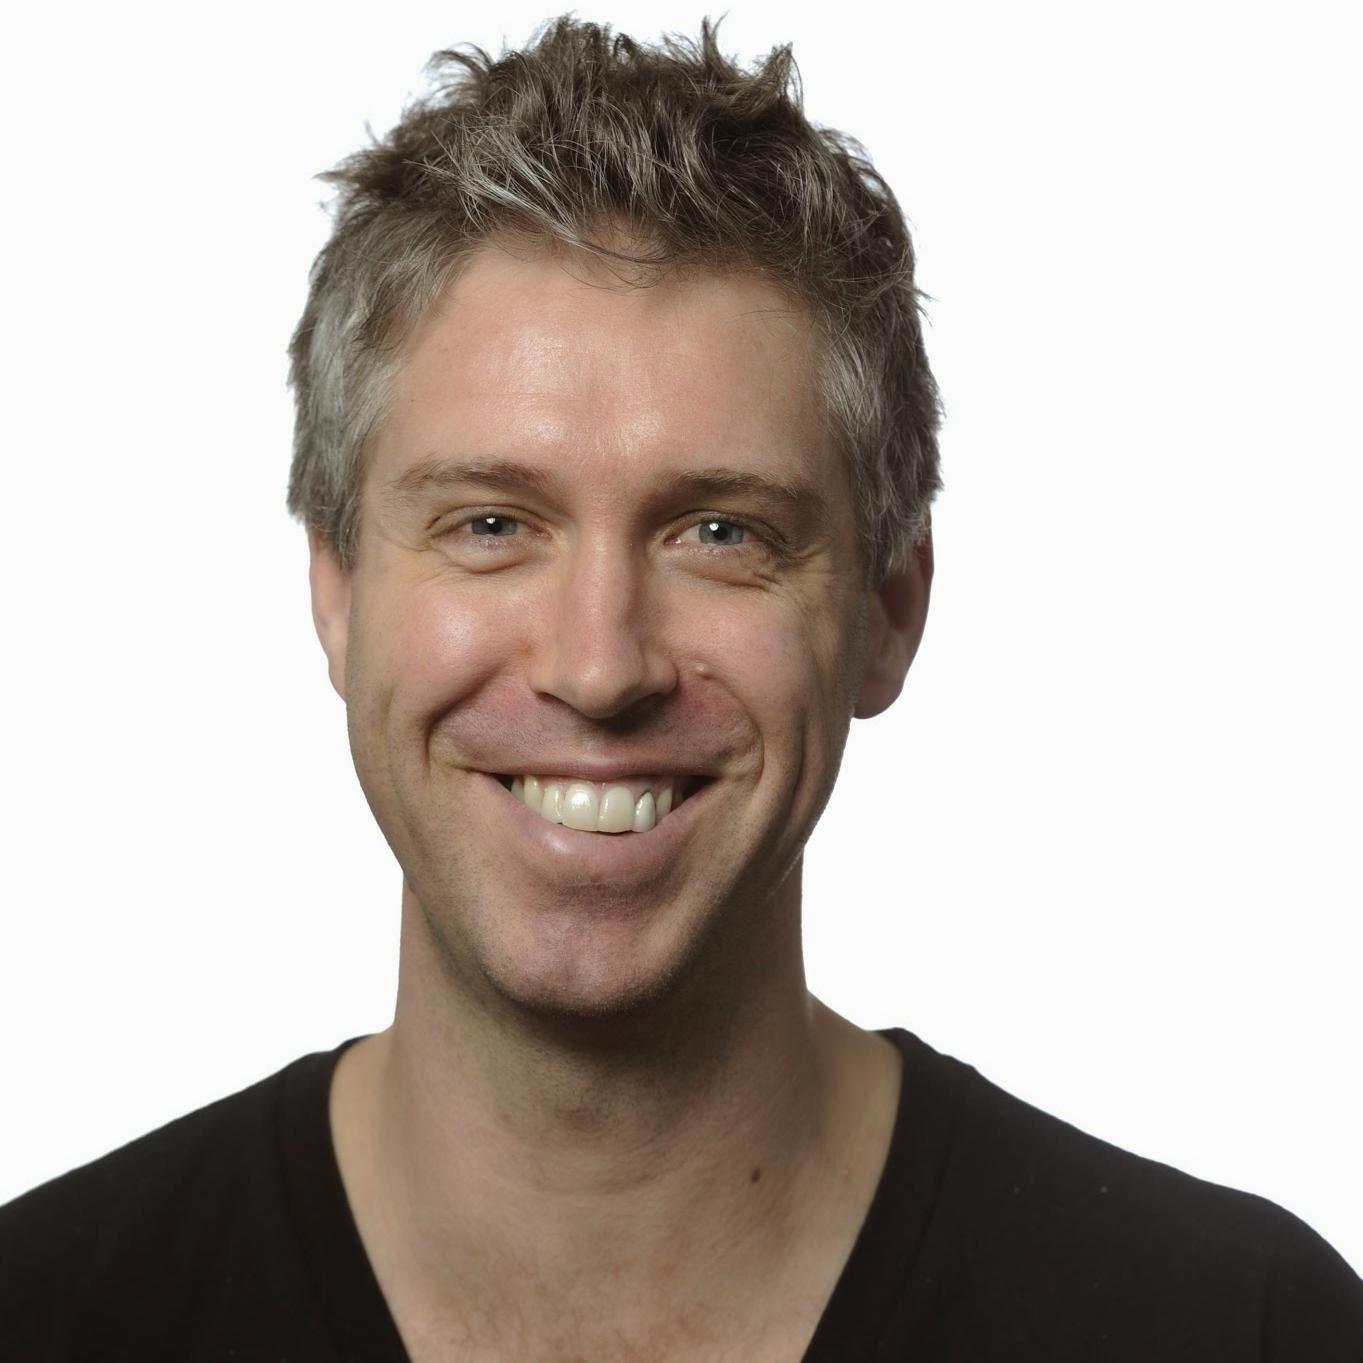 Cameron McGrane